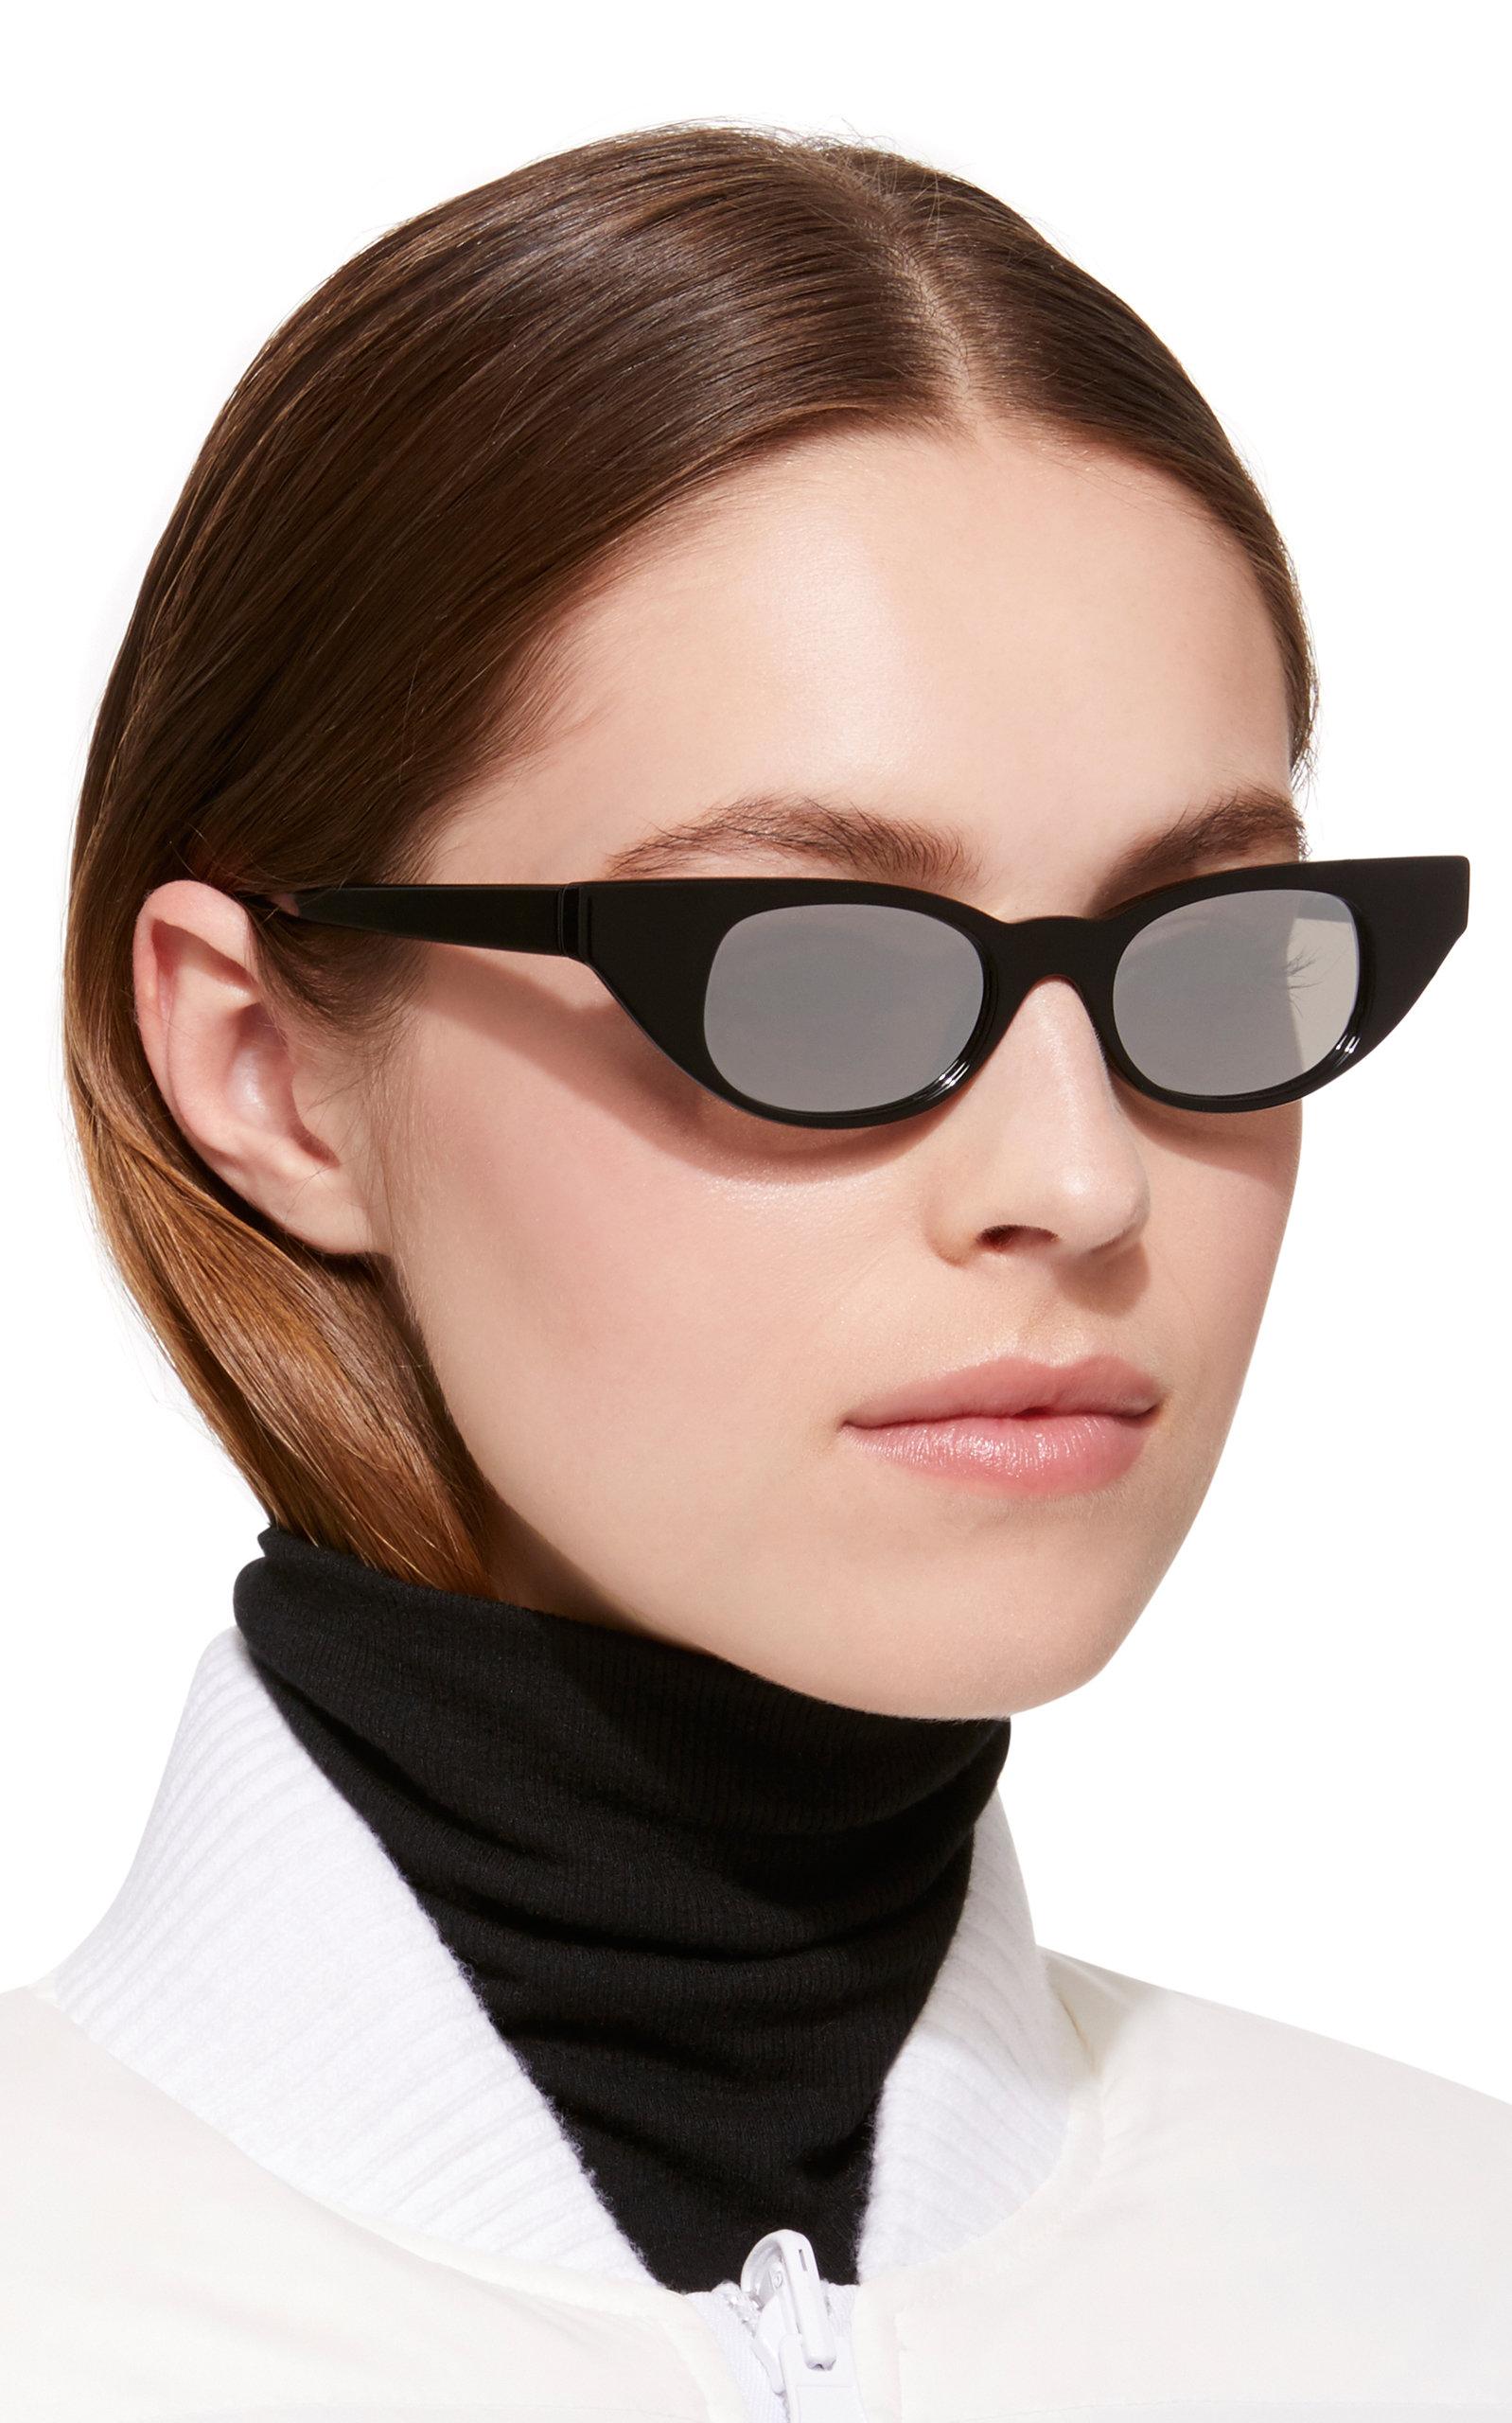 e5dcb9745bbb6 Adam Selman X Le SpecsThe Breaker Cat-Eye Sunglasses. CLOSE. Loading